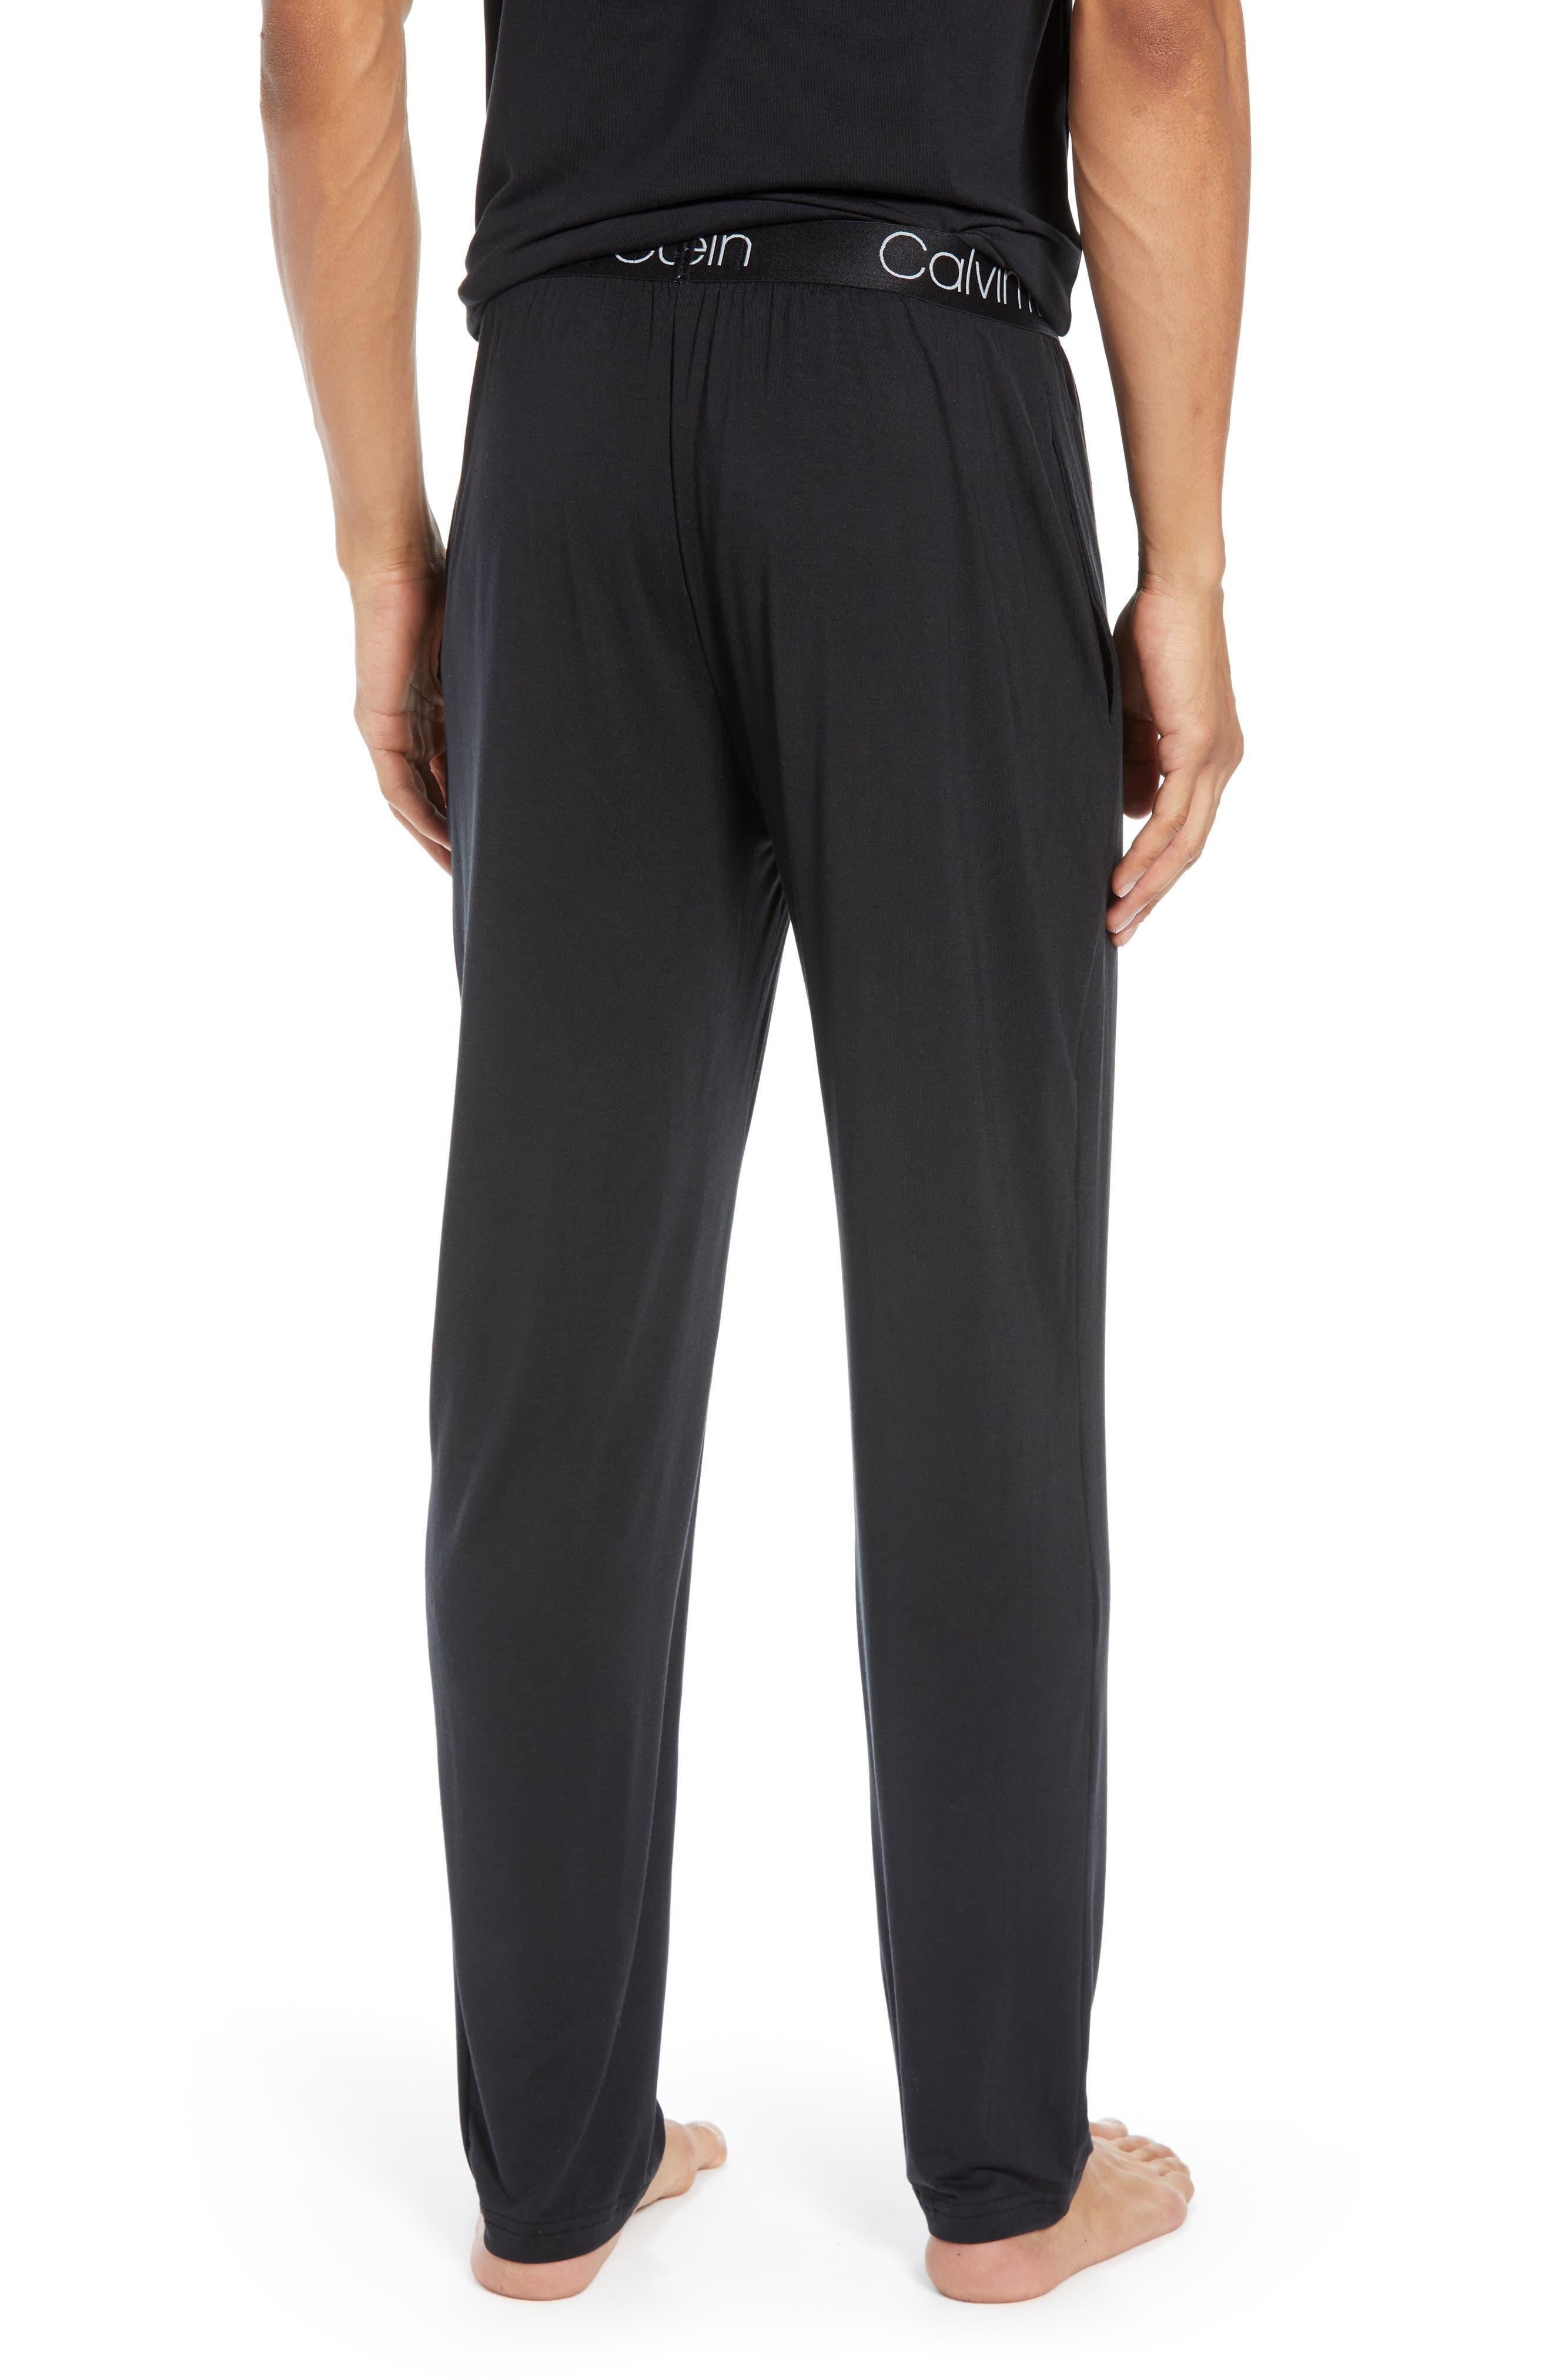 CALVIN KLEIN,                             Stretch Modal Lounge Pants,                             Alternate thumbnail 2, color,                             BLACK